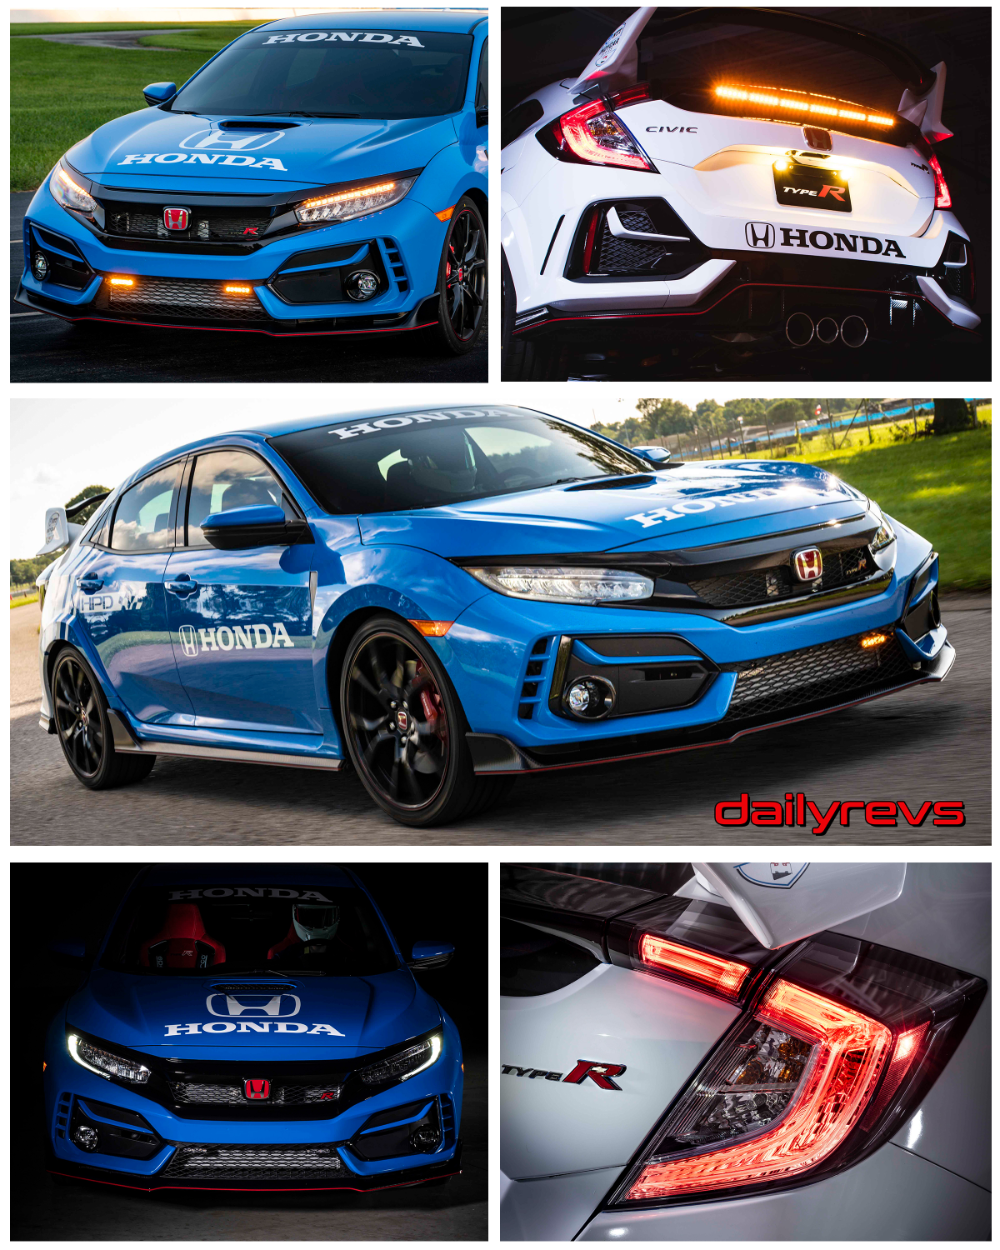 2020 Honda Civic Type R Pace Car Dailyrevs in 2020